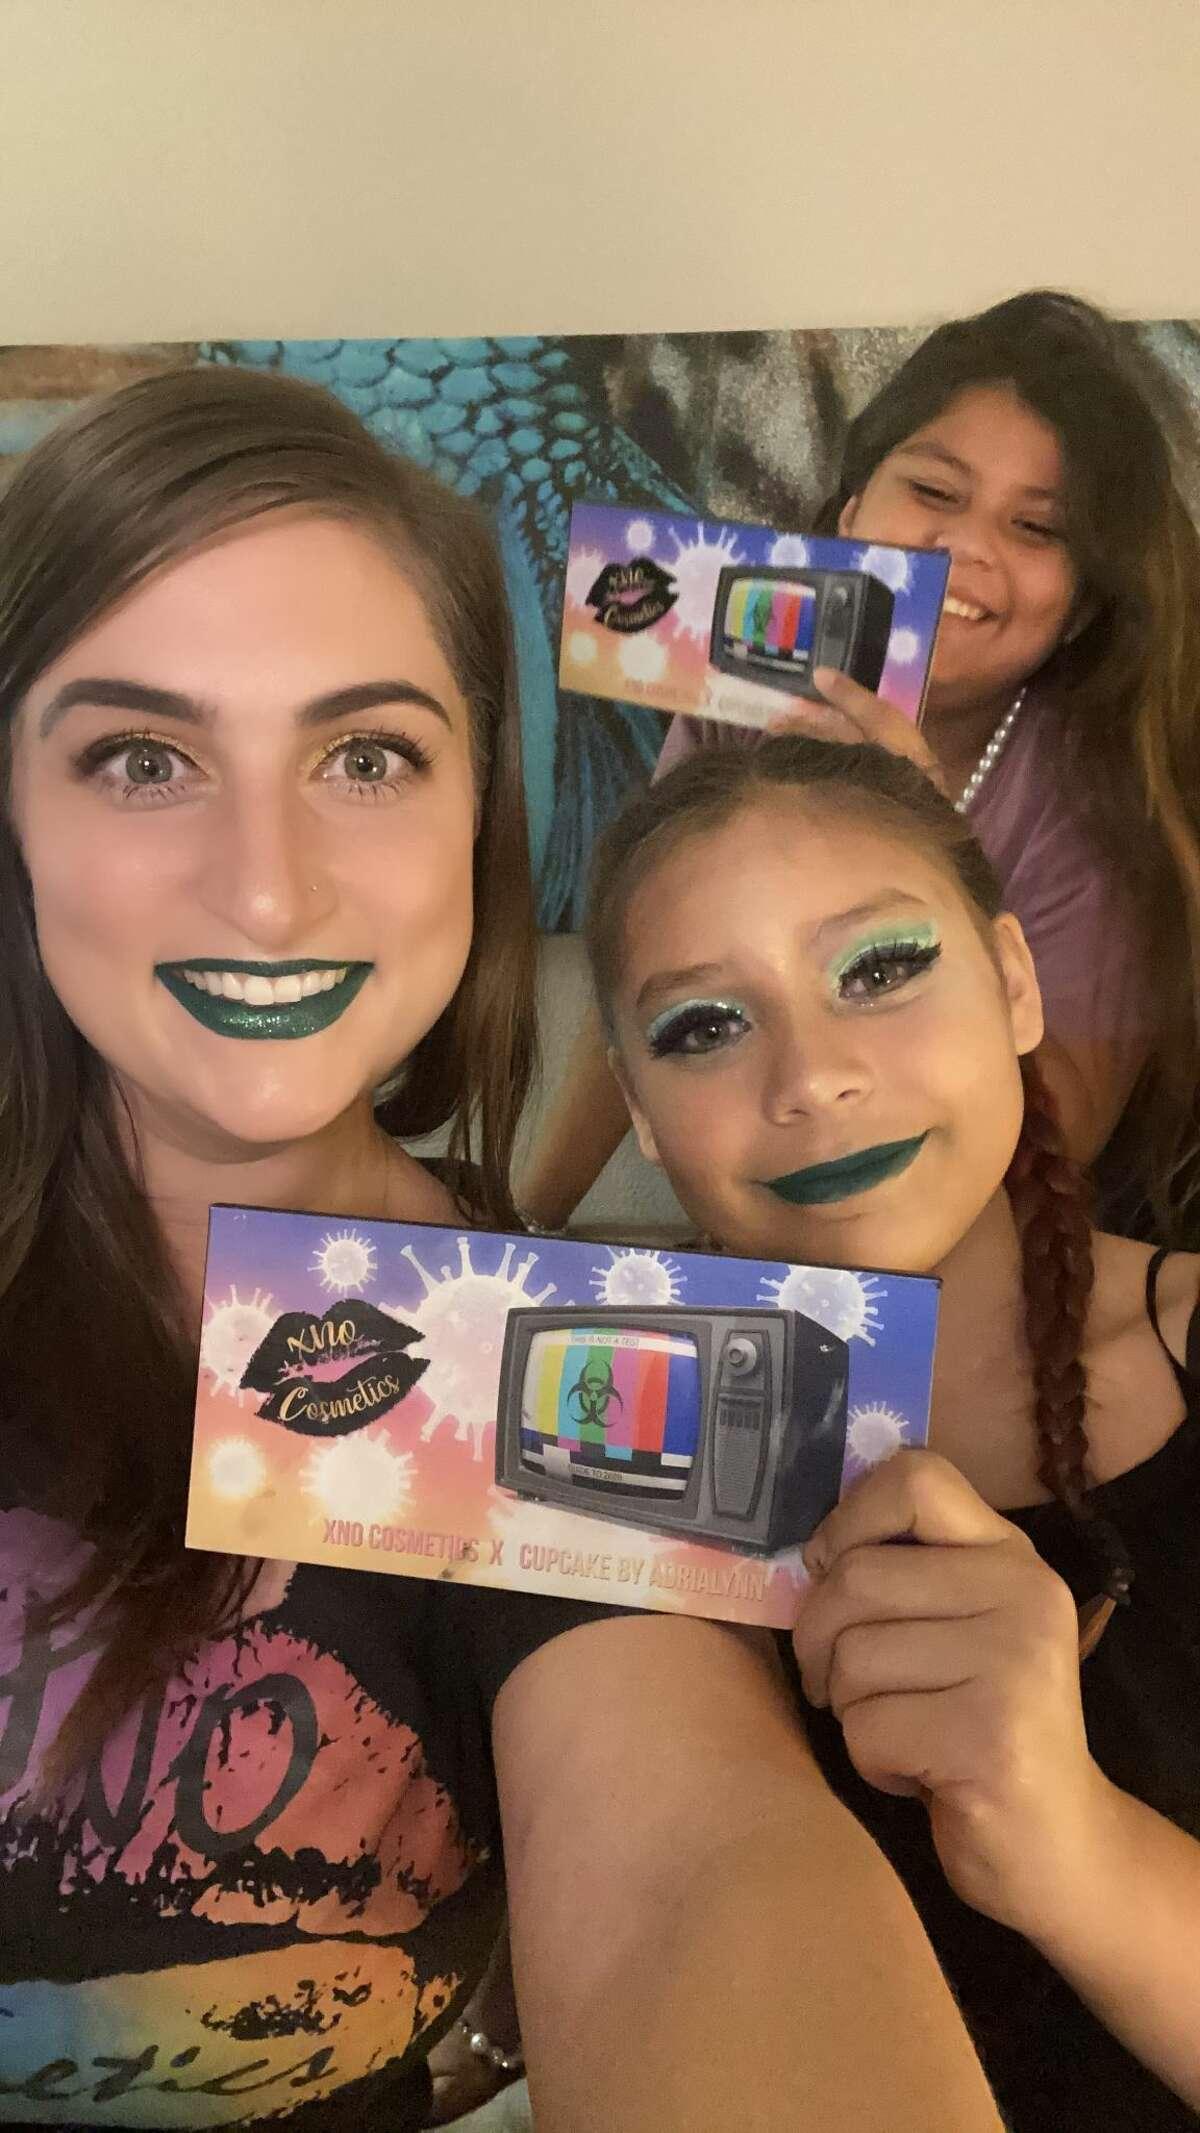 Adrialynn Alvarado, 12, a San Antonio makeup YouTuber has launched her first eyeshadow palette with XNO Cosmetics founder Brandy Keppol.